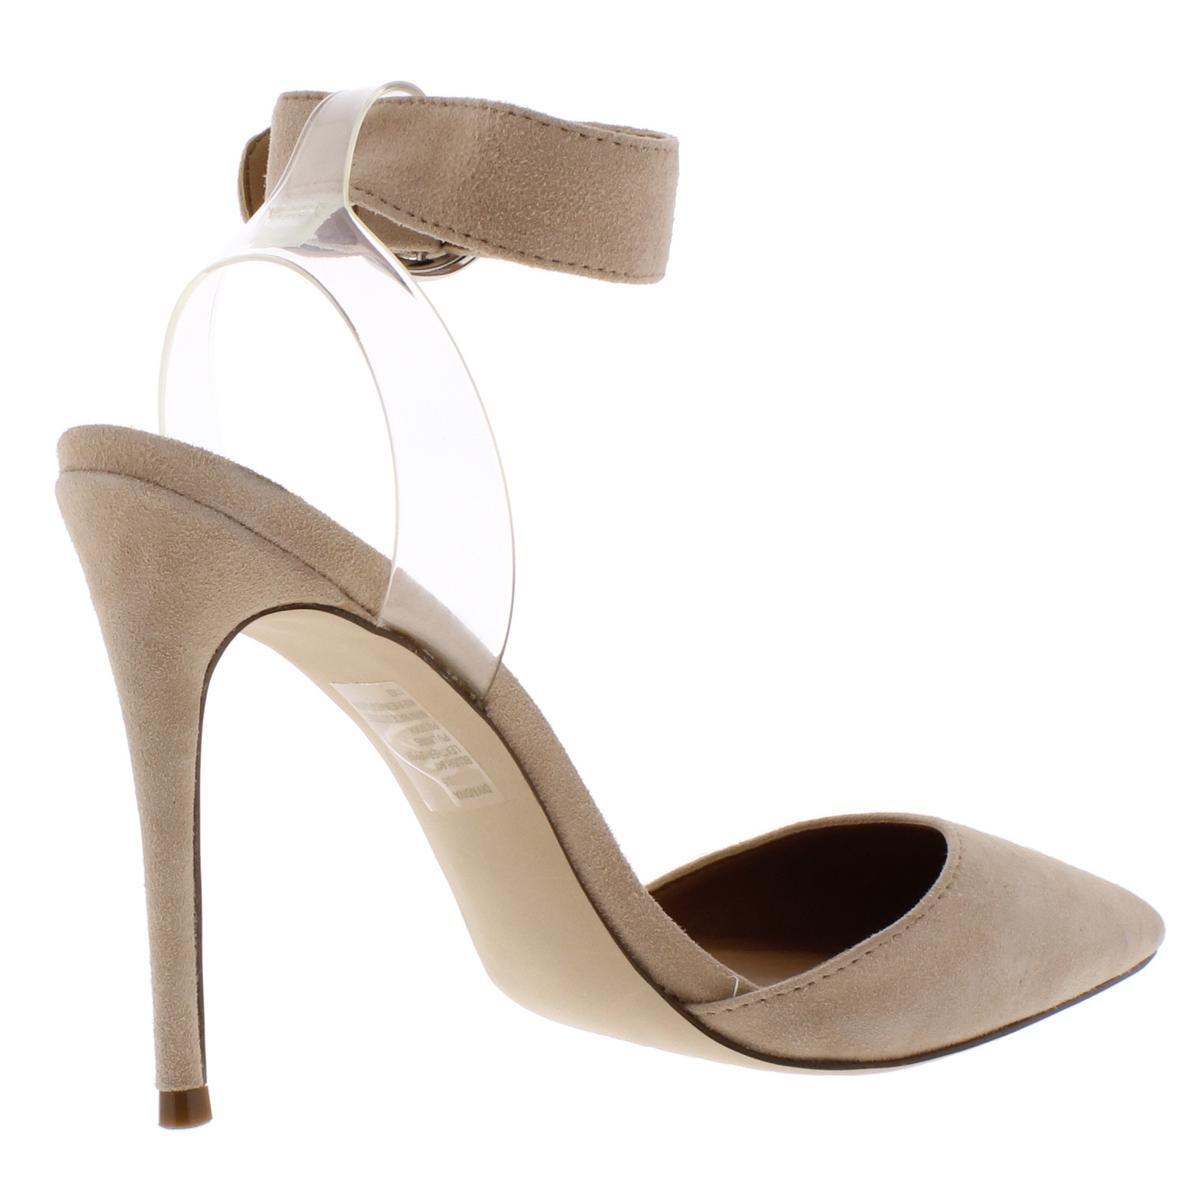 Steve-Madden-Womens-Diva-Stiletto-Pointed-Toe-Pumps-Shoes-BHFO-1554 thumbnail 4